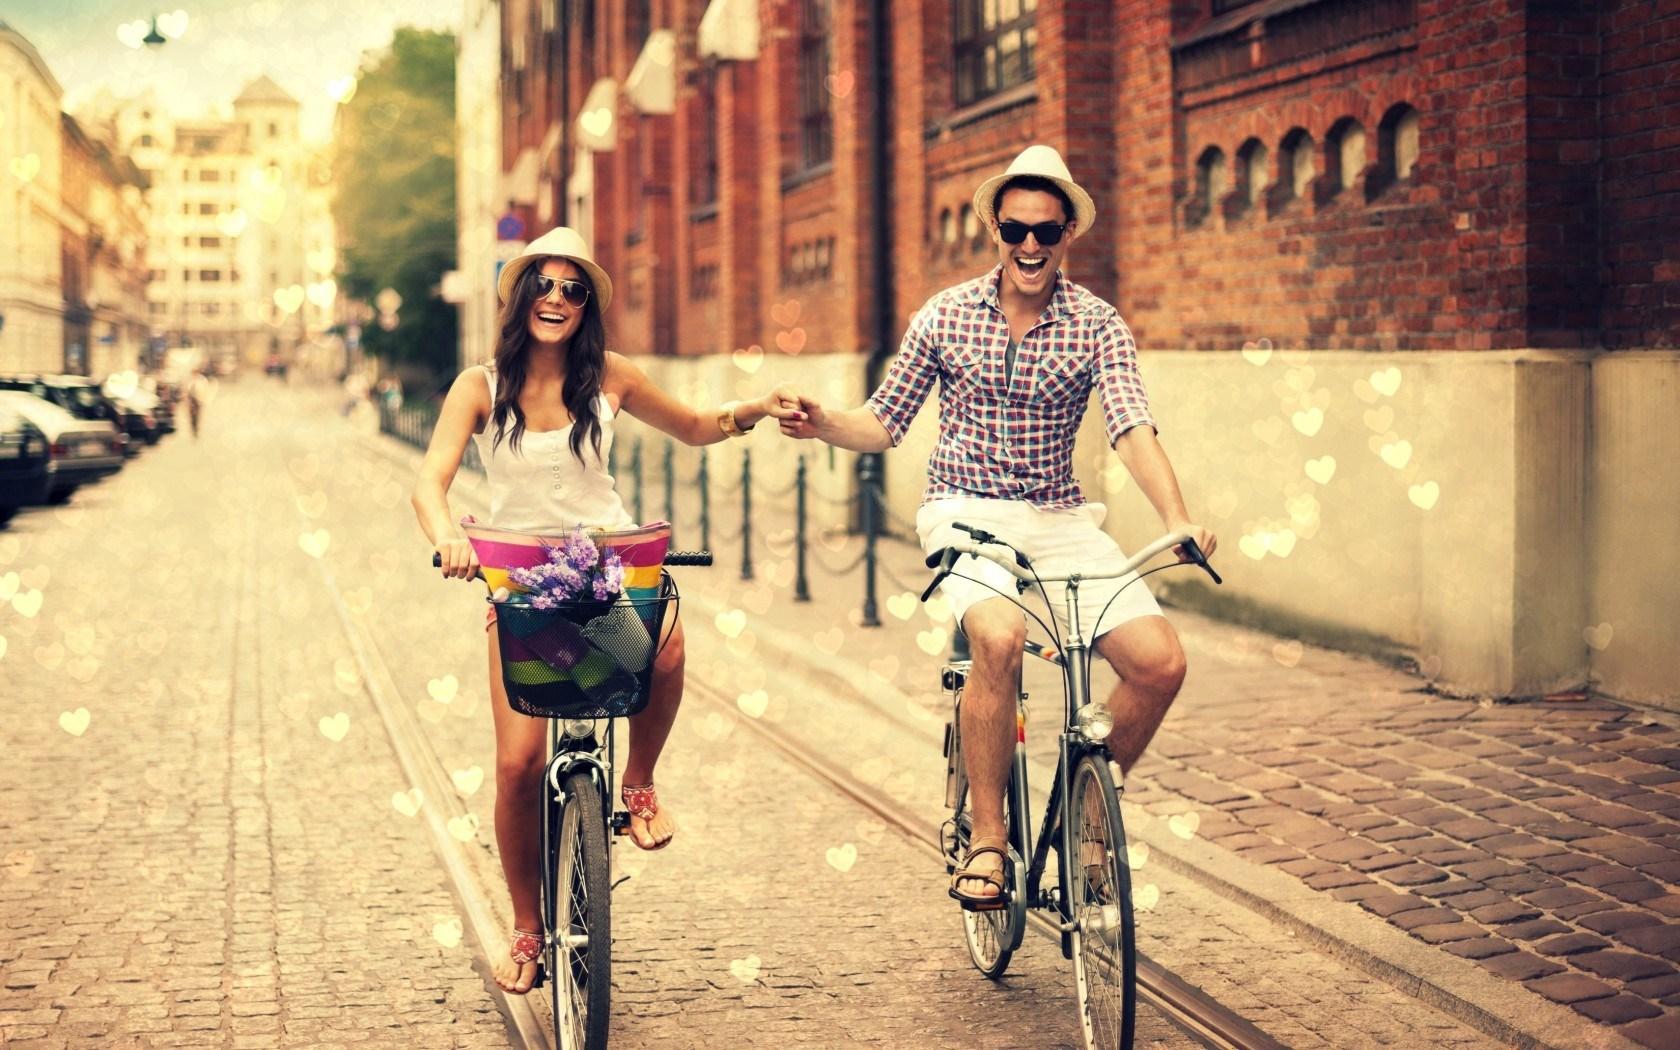 Mood Boy Girl Bicycles Love Hearts